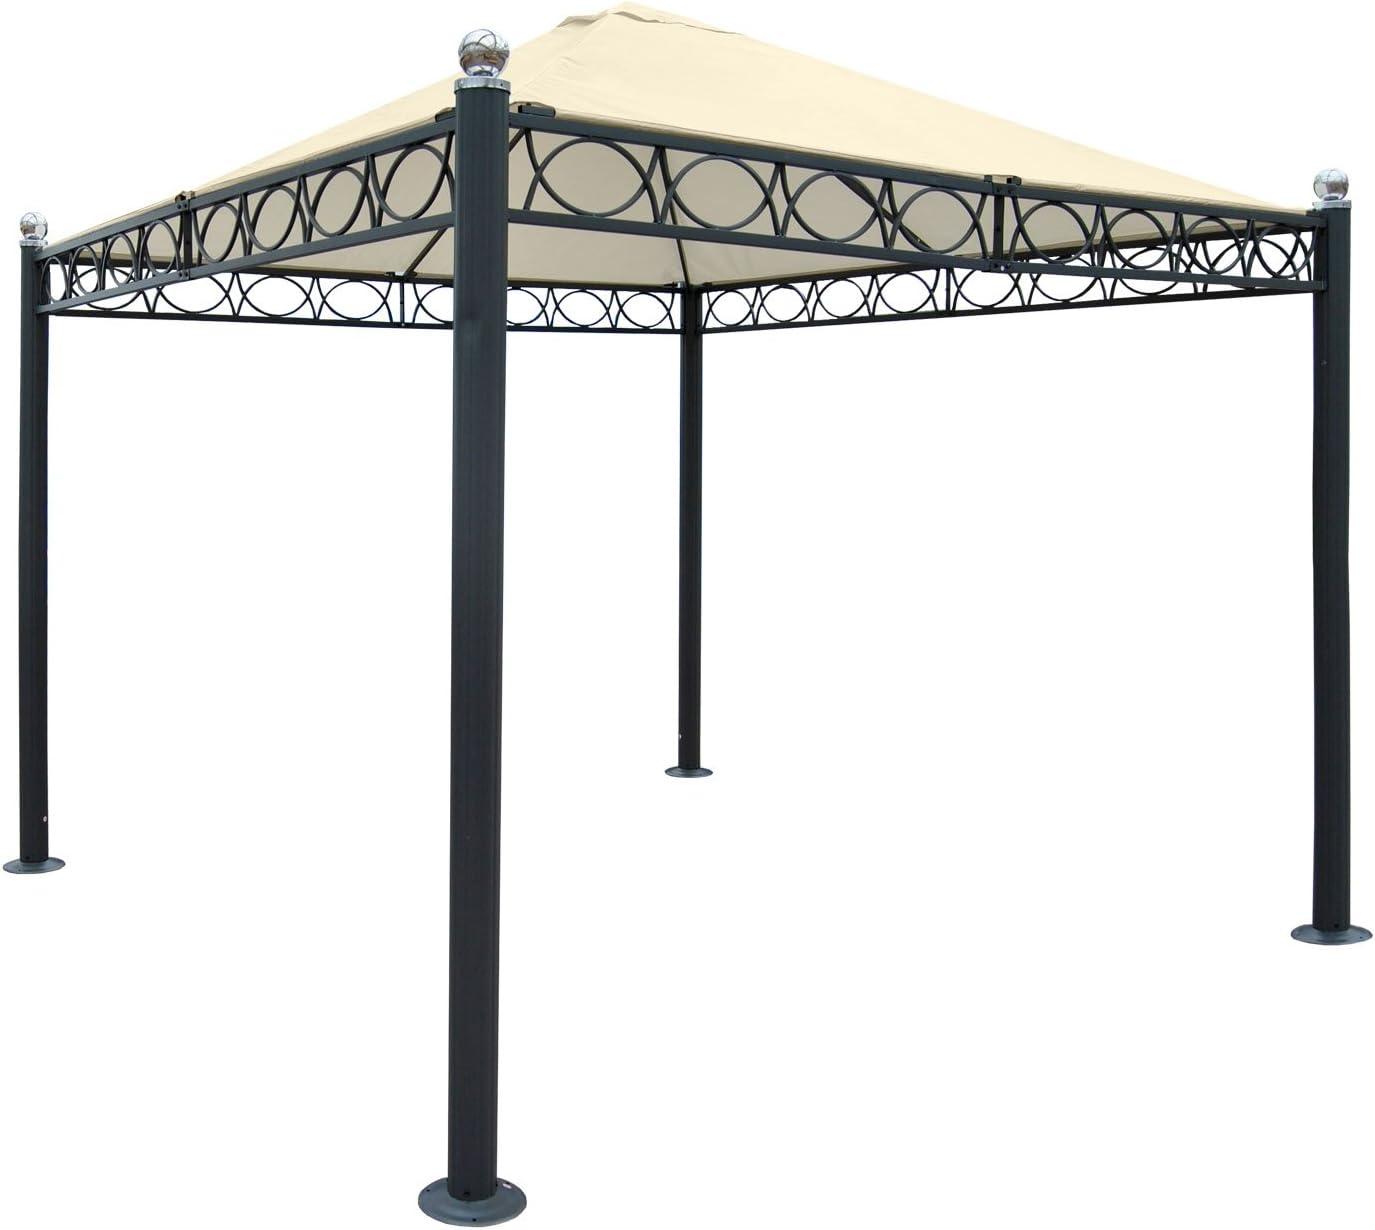 Pergola Bela Antigua, Cenador, estructura estable de 10 cm de lujo aluminio, 3 x 3 m ~ Sin pared laterales